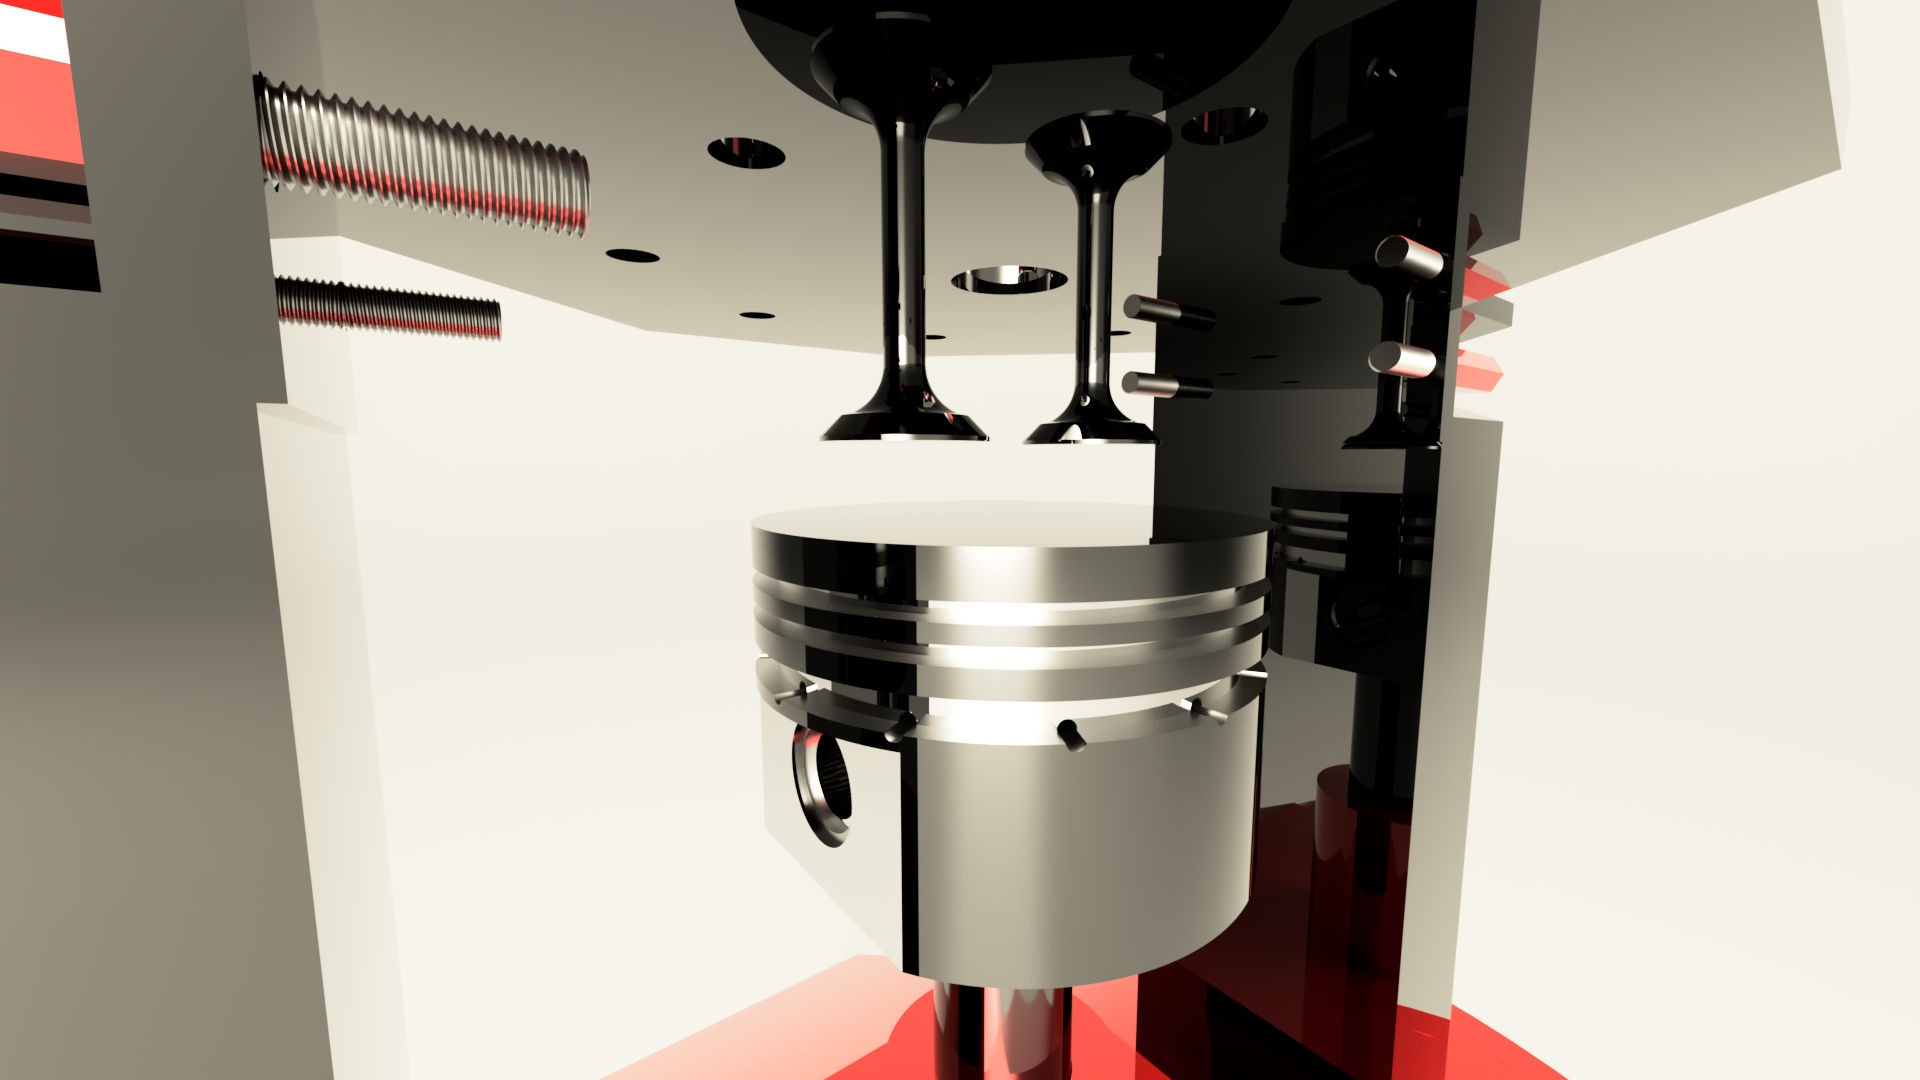 Elliptical-engine-version-3-2018-jul-28-03-12-05am-000-customizedview5317021360-jpg-3500-3500